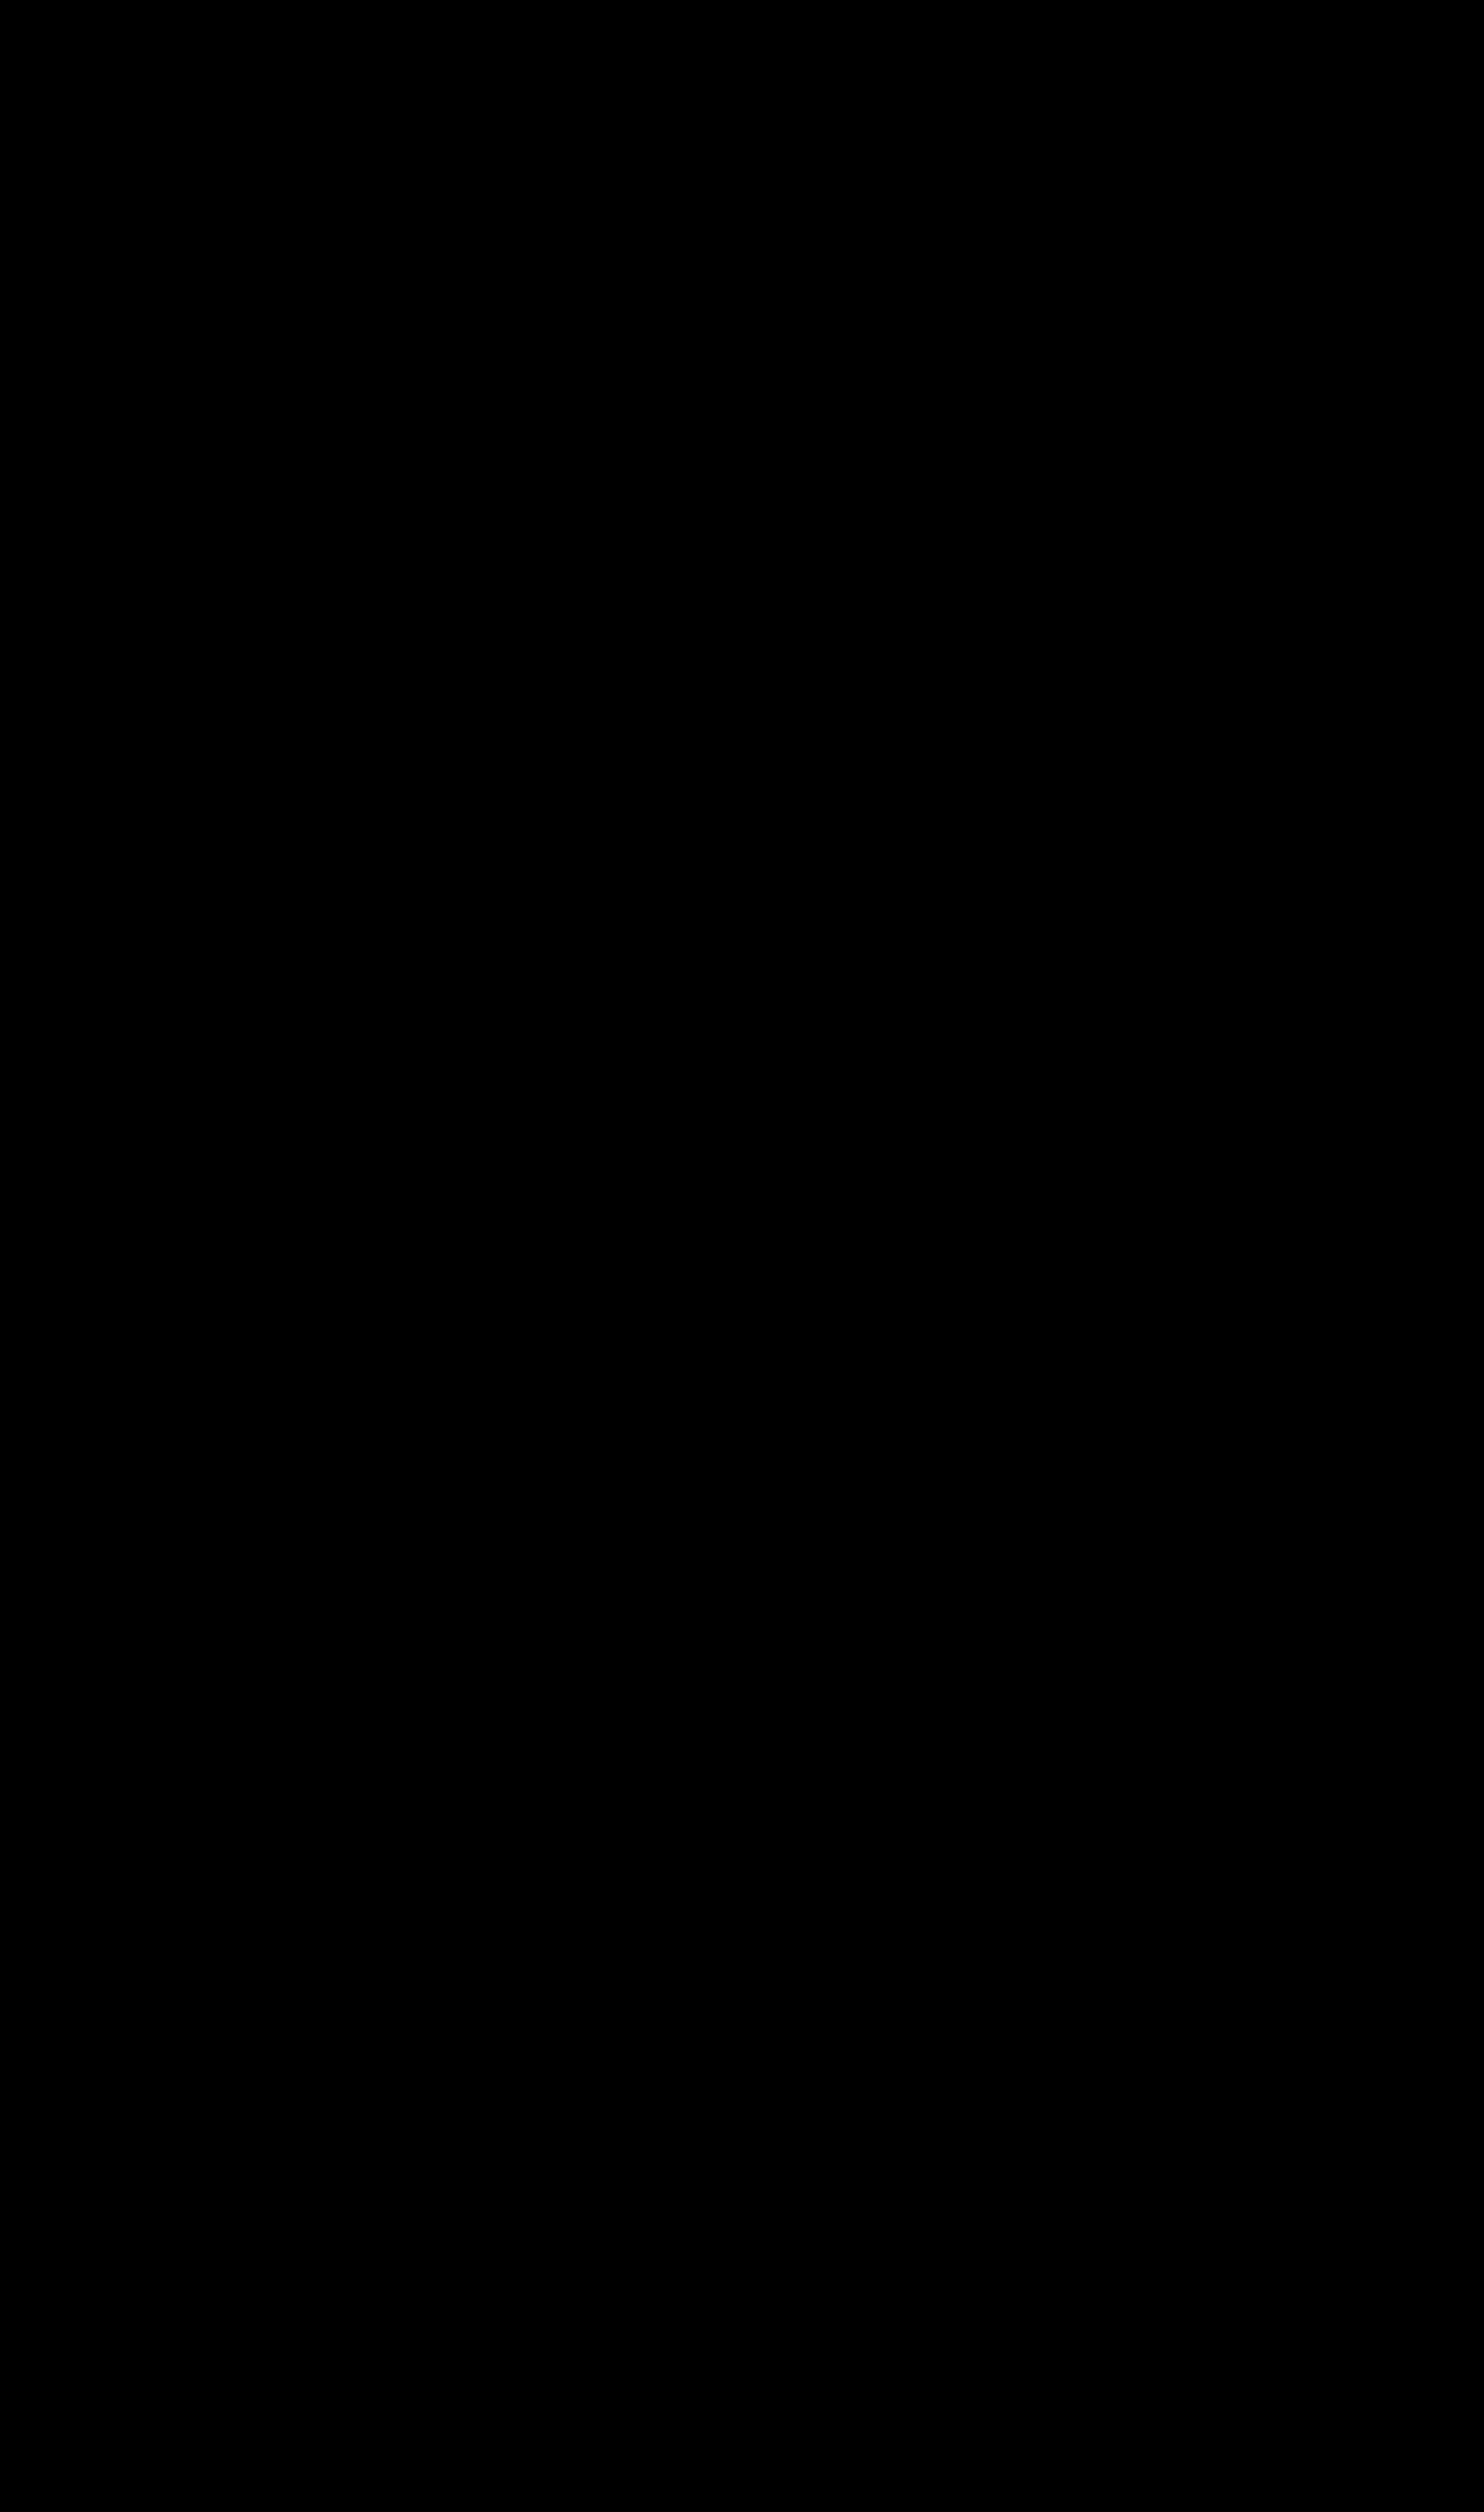 Lightbulb HD PNG - 118948